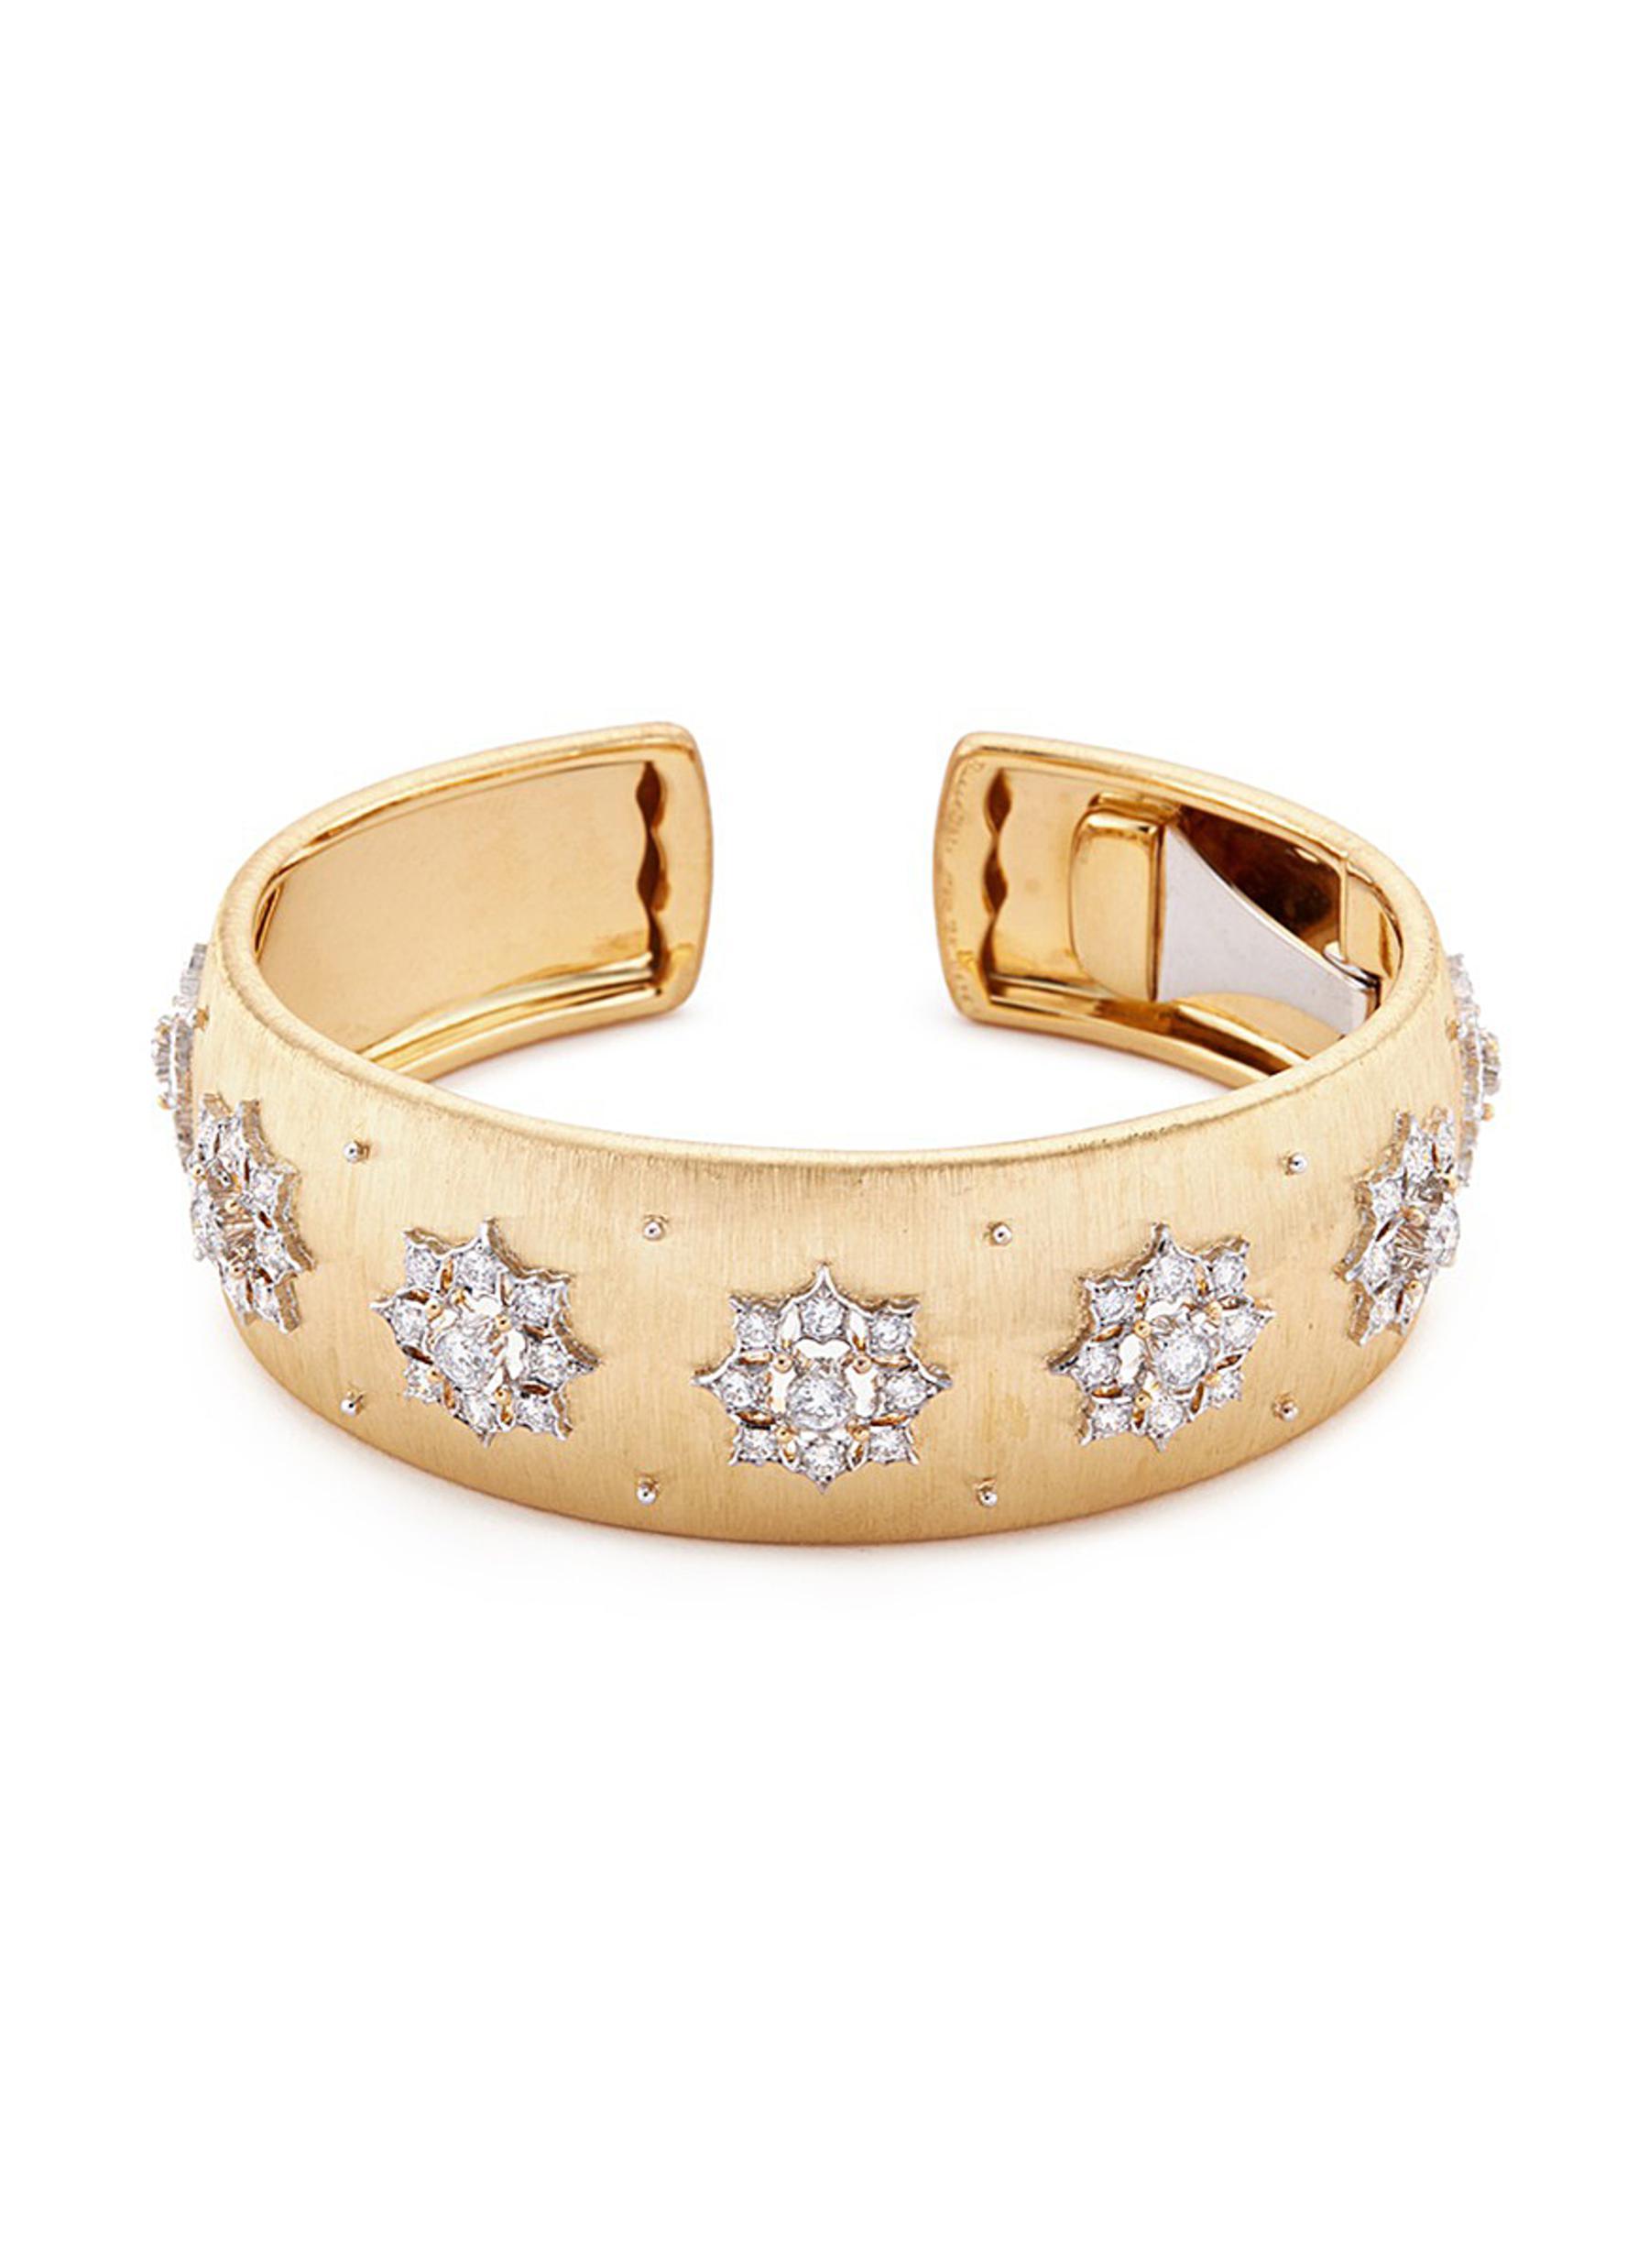 Diamond floral 18k yellow gold cuff